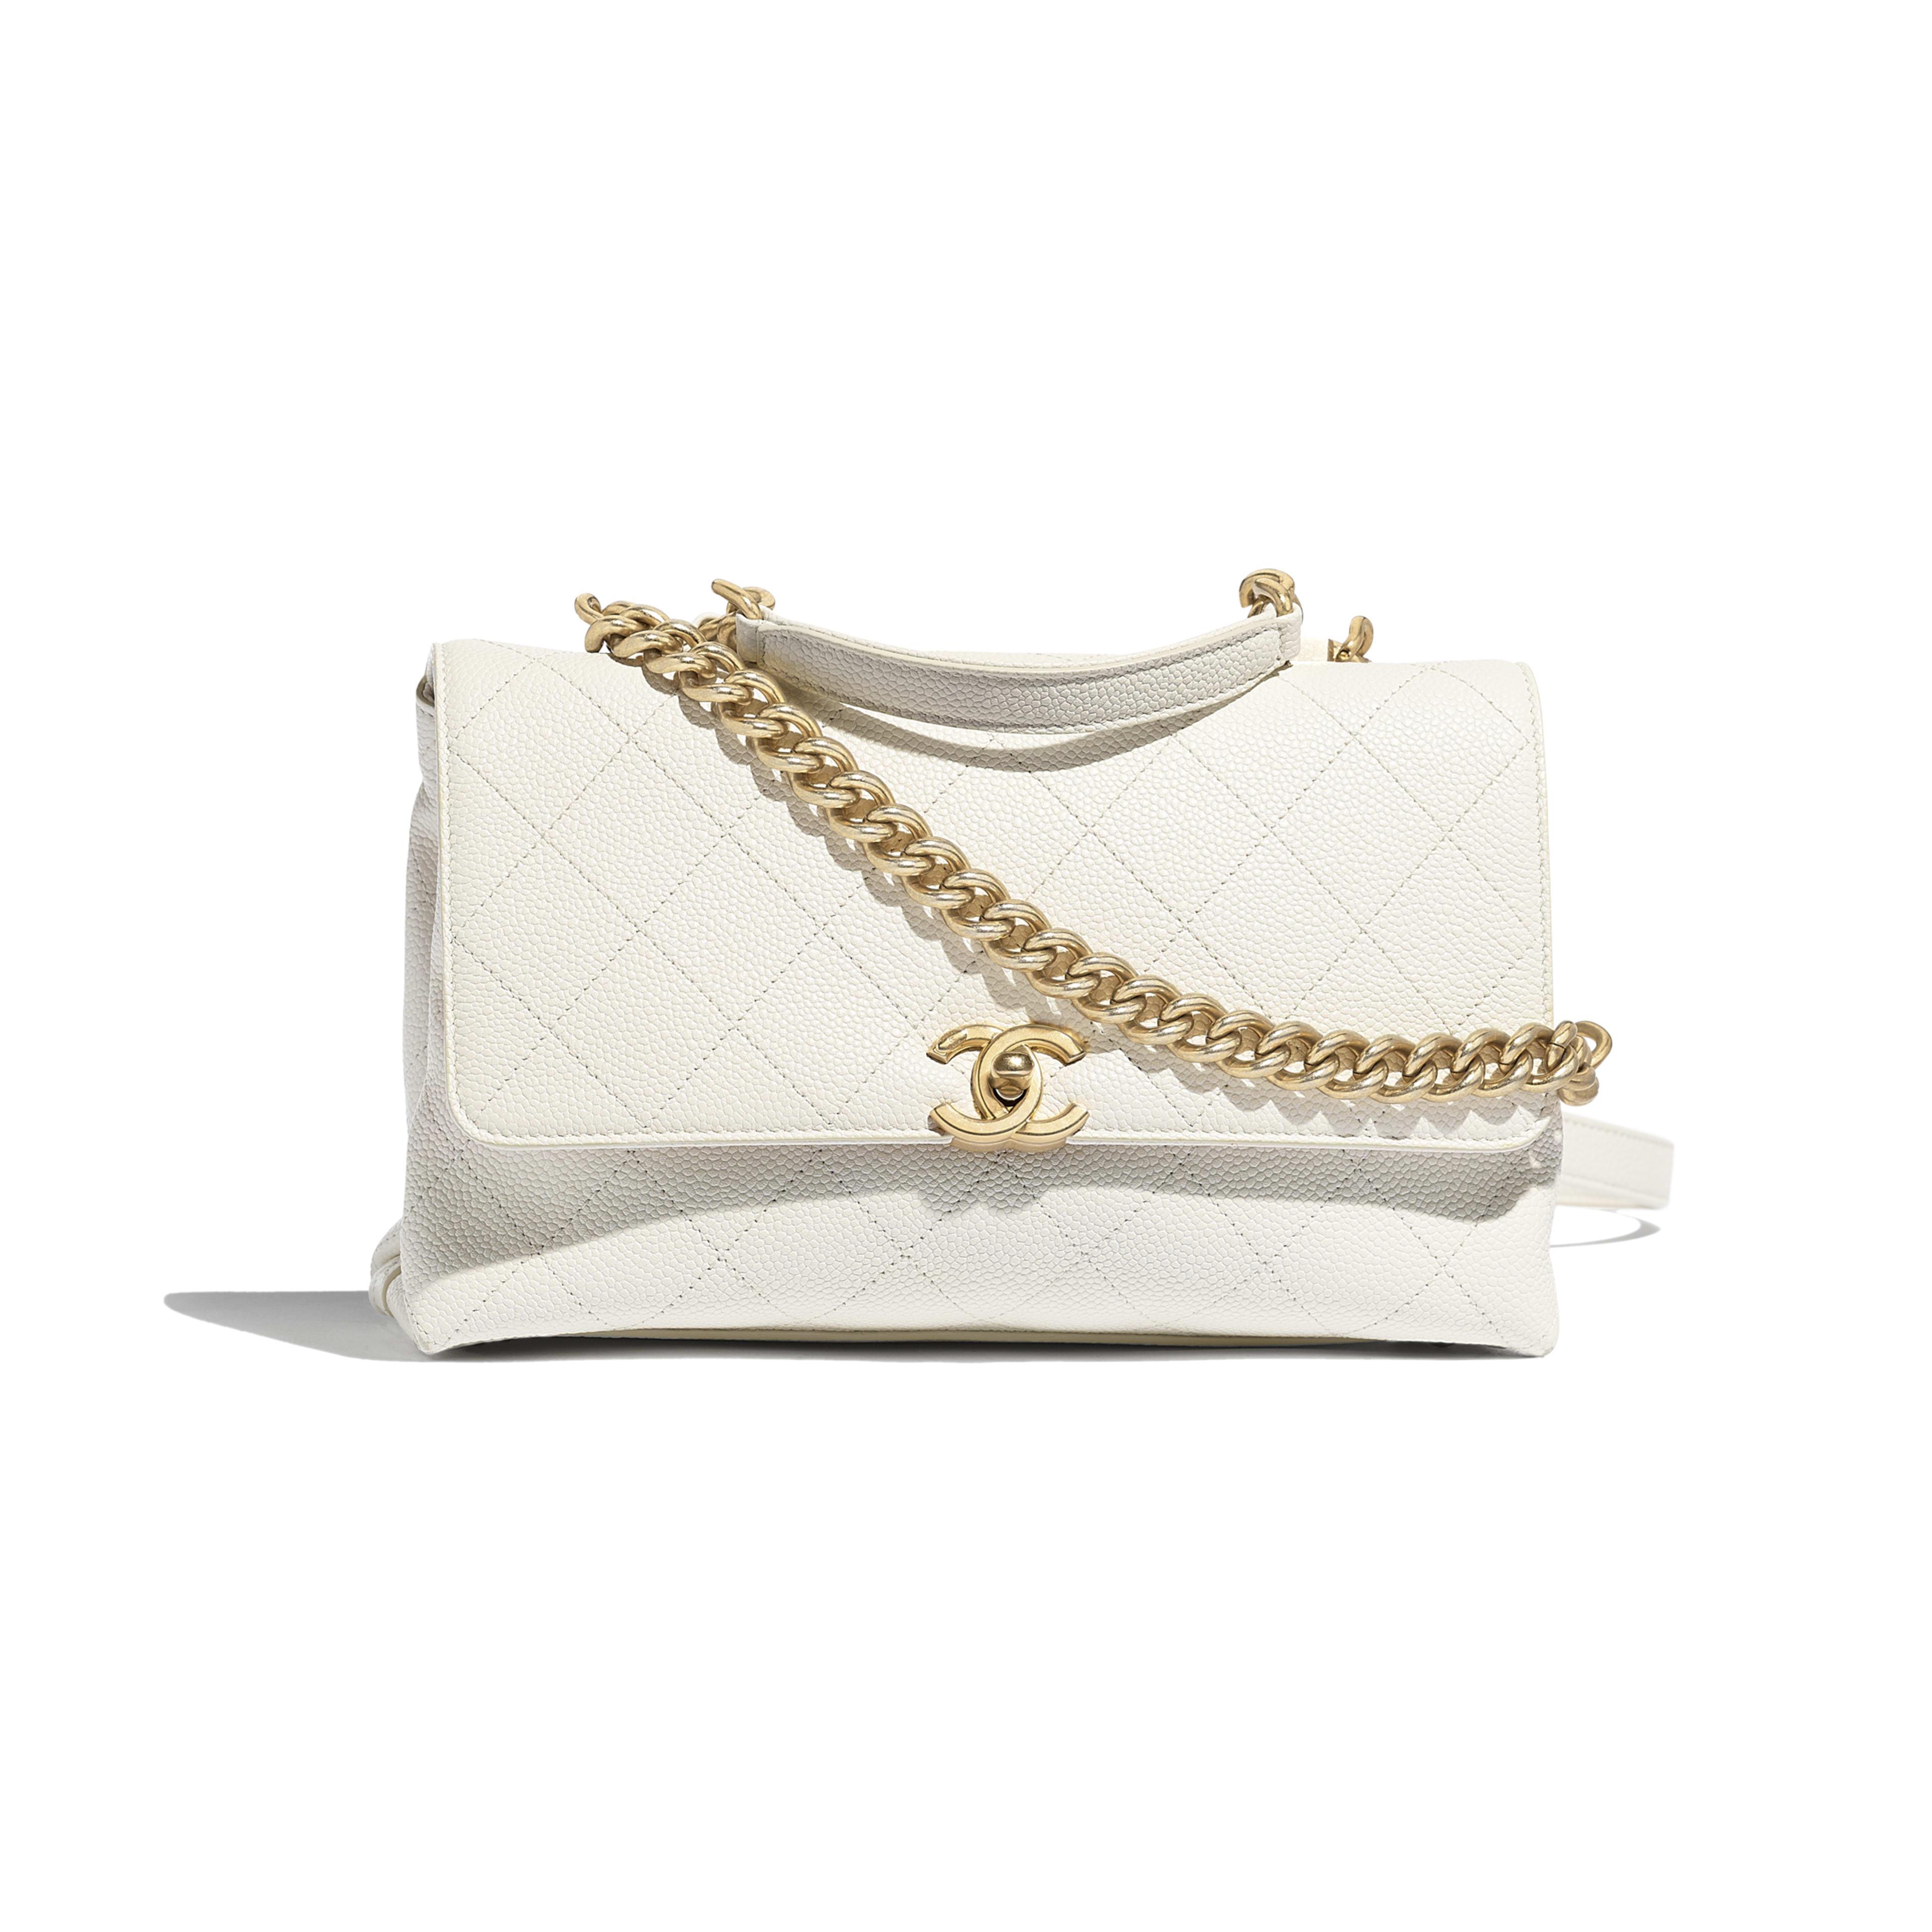 4c116cea2f Flap Bag - White - Grained Calfskin   Gold-Tone Metal - Default view ...